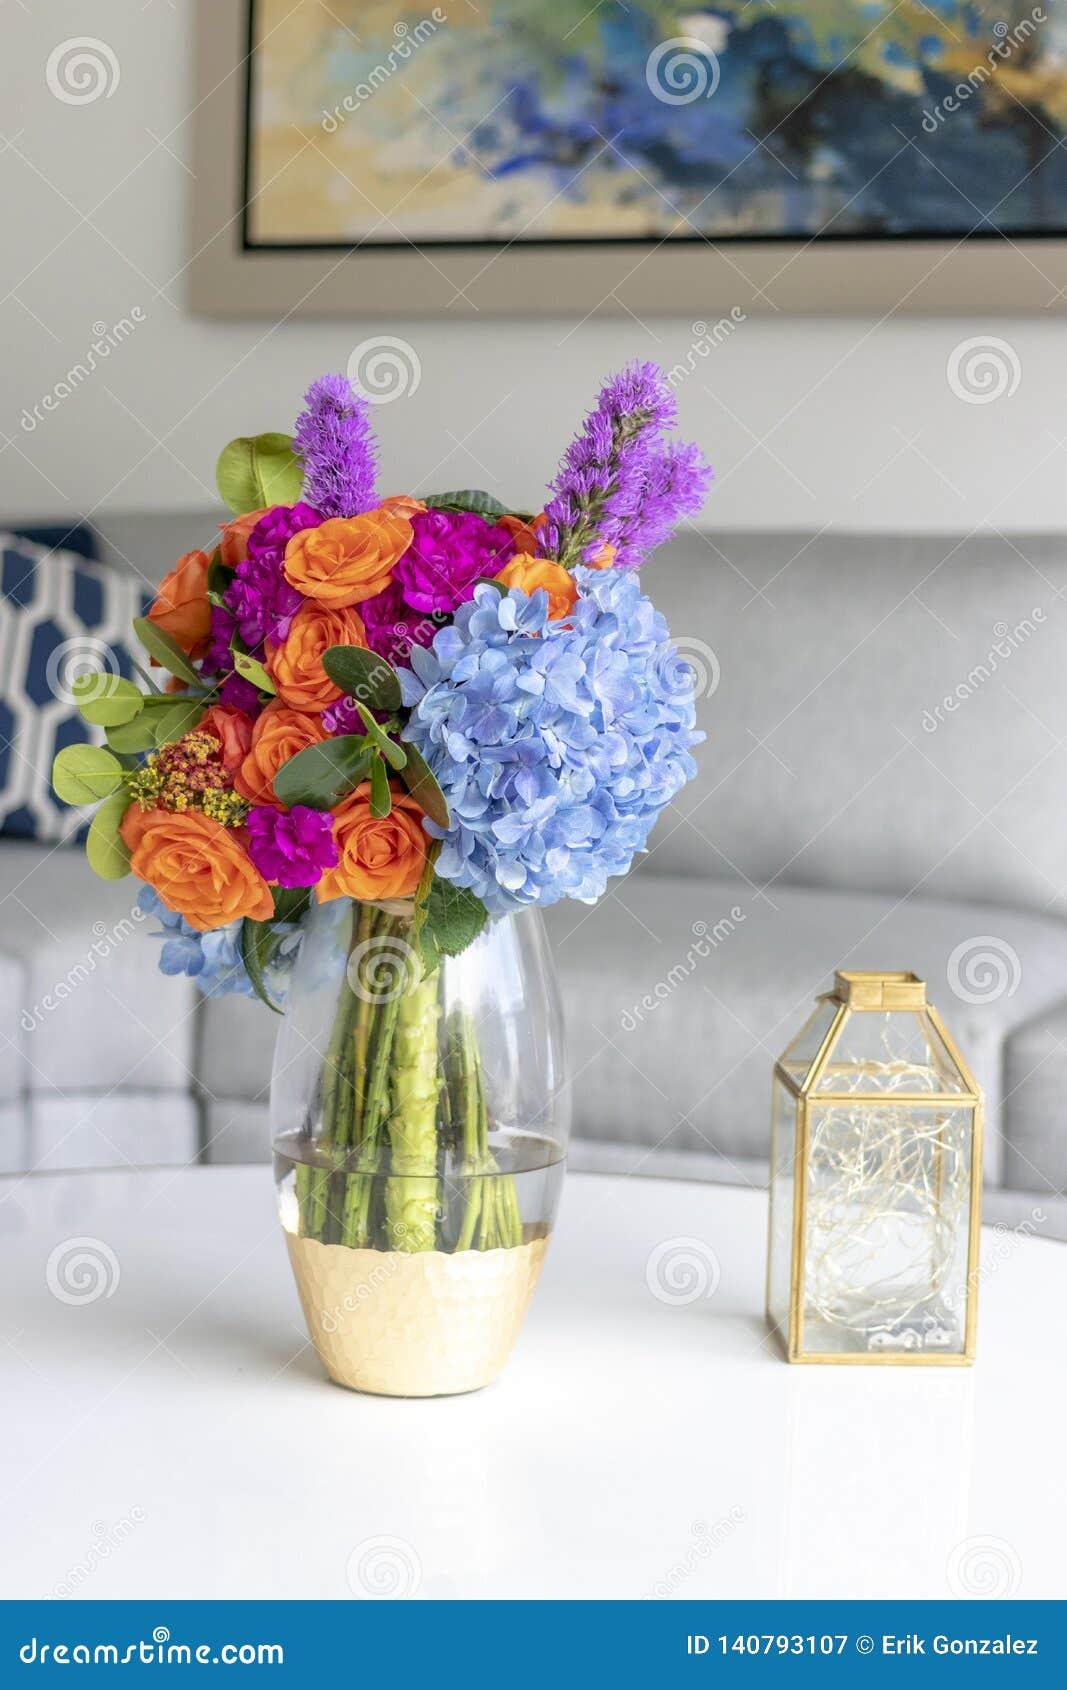 Arreglo Floral Que Adorna La Sala De Estar De La Casa Imagen